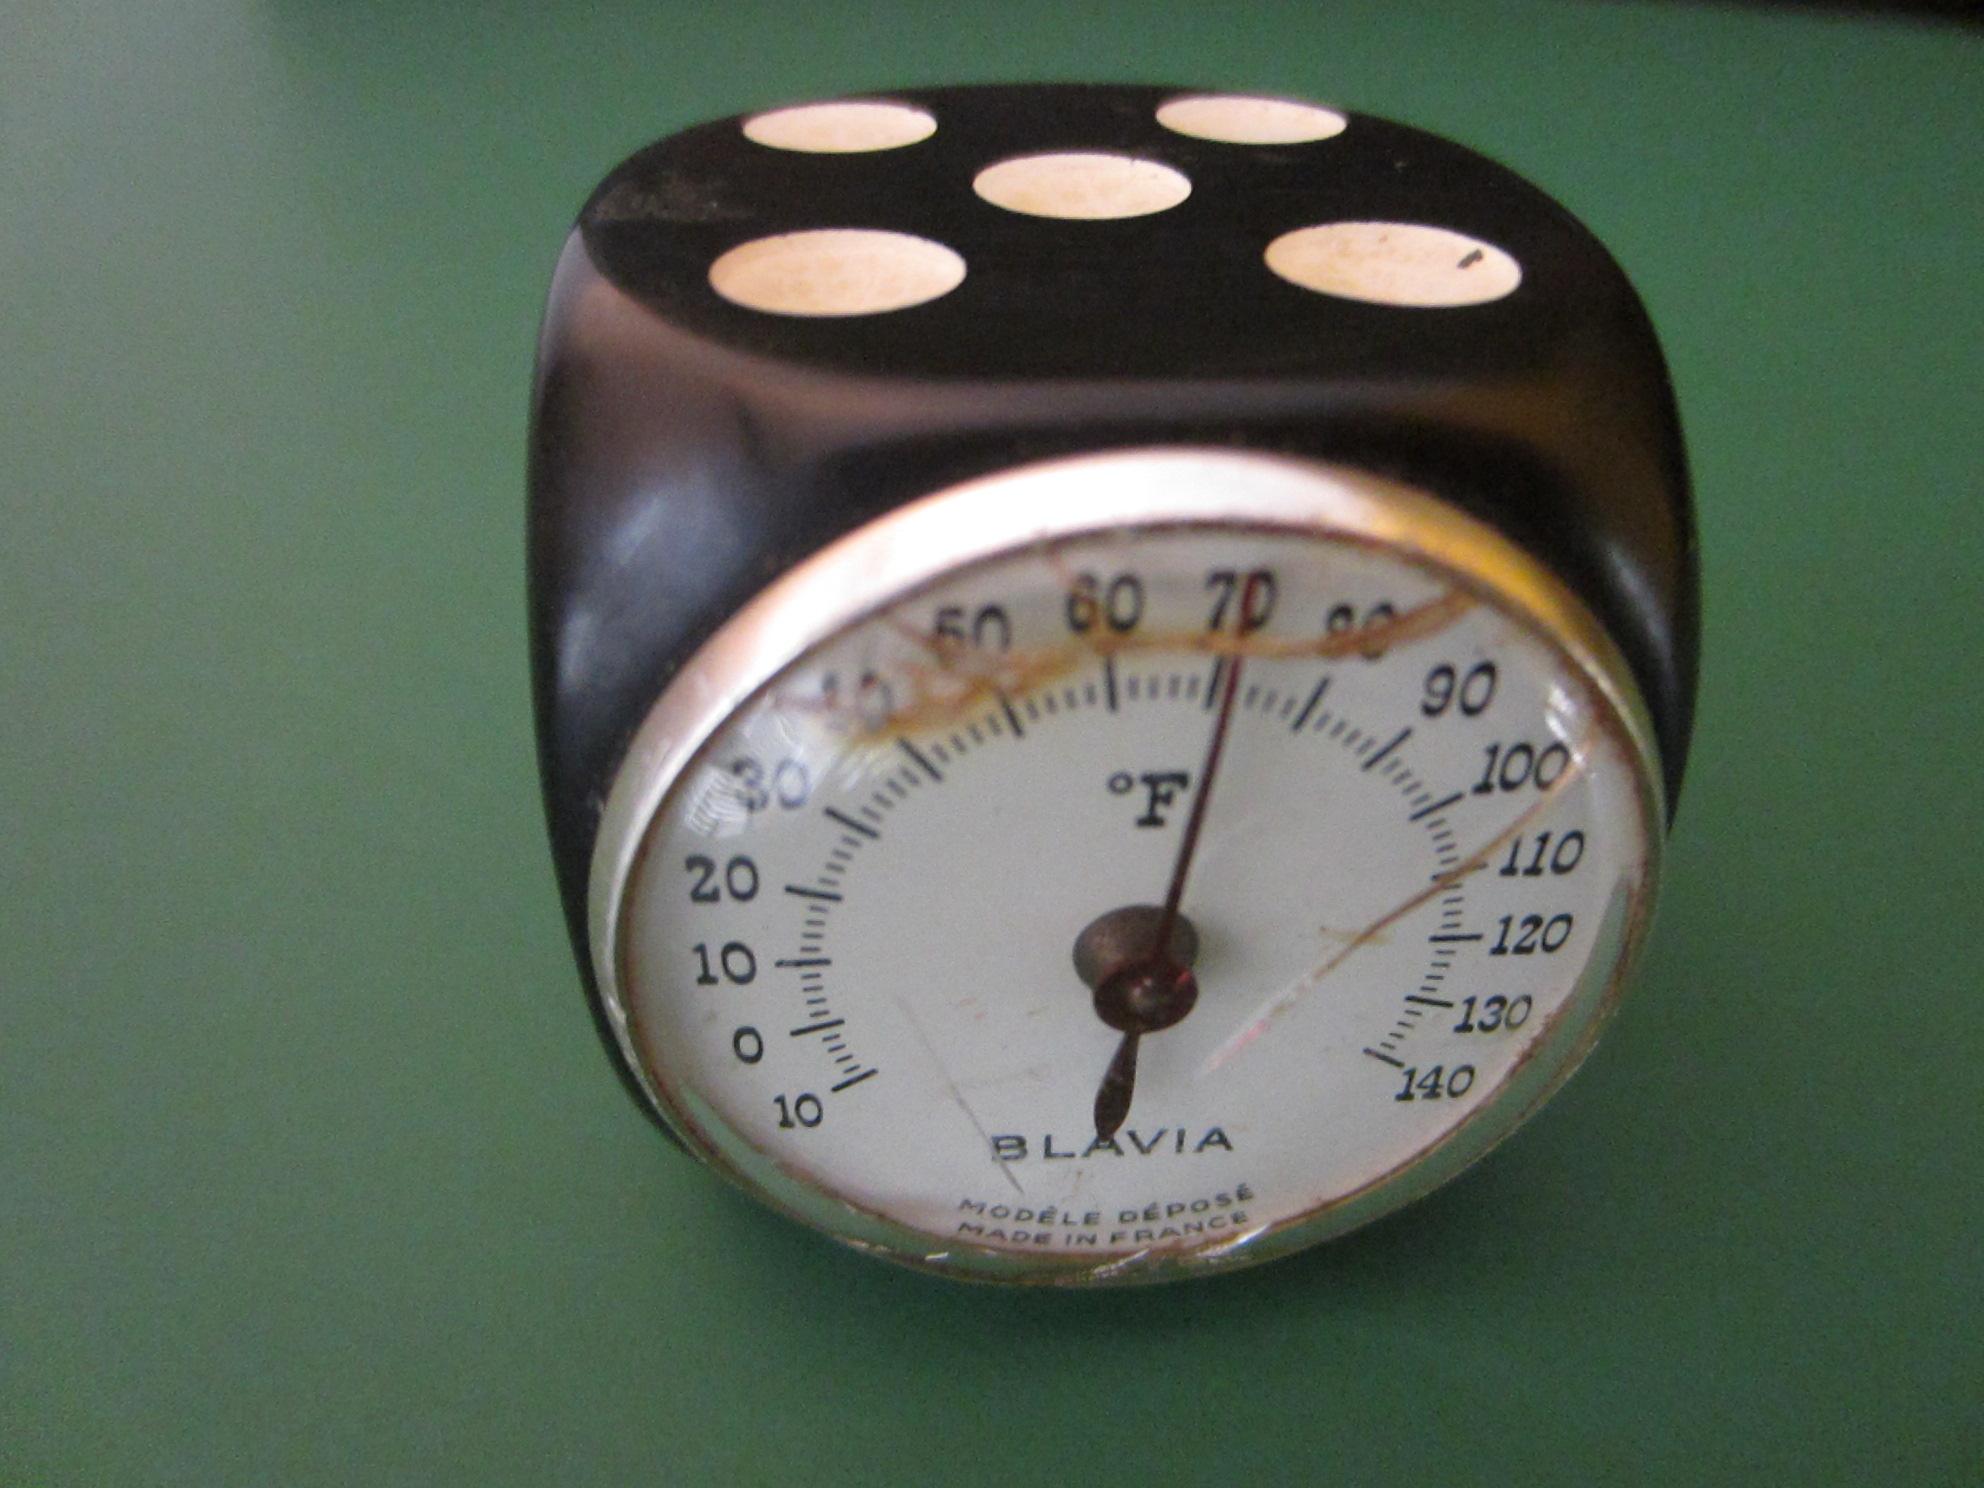 France Blavia Modele Depose Dice Thermometer For Sale